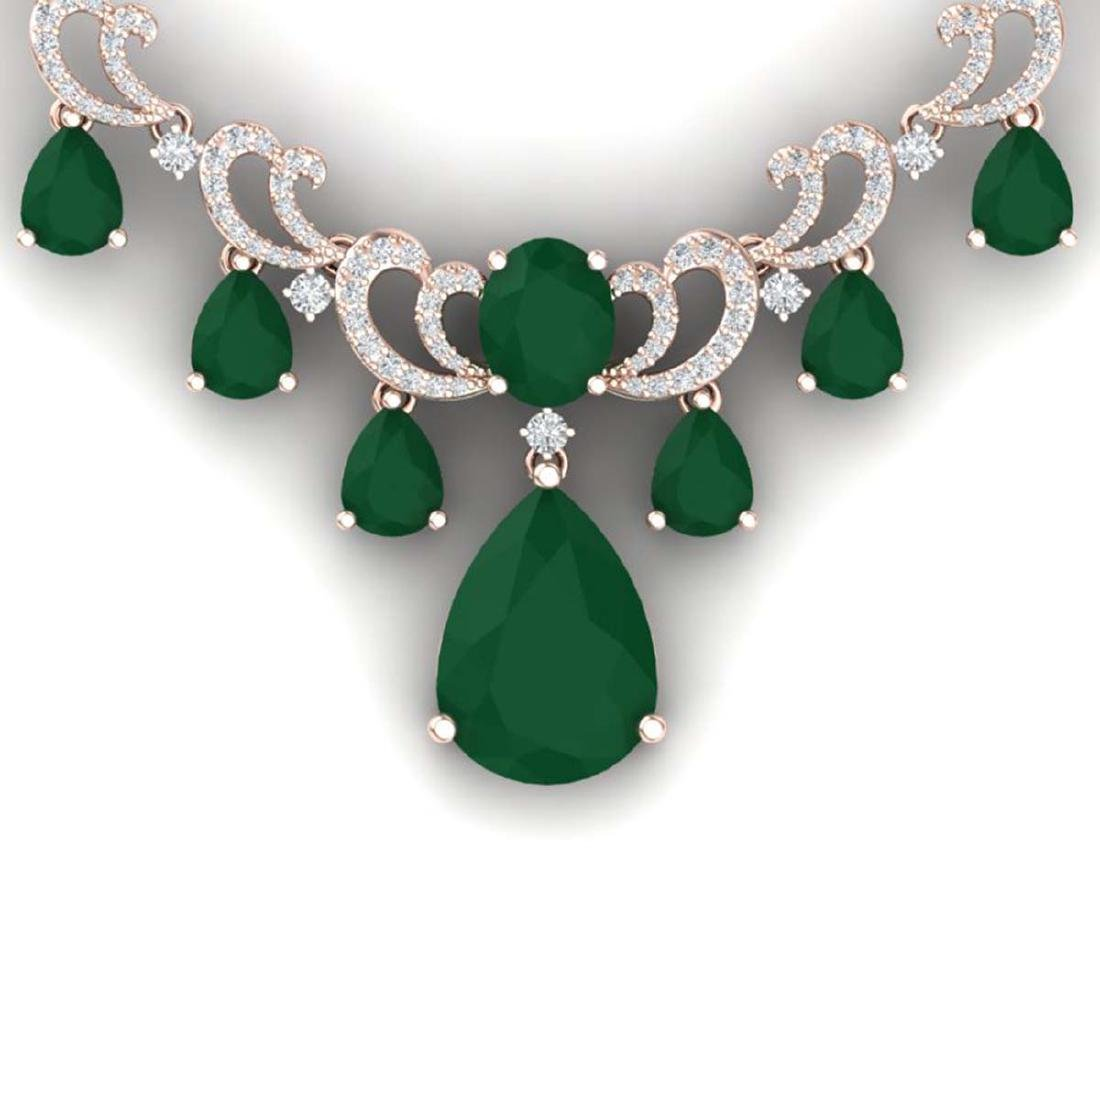 36.85 ctw Emerald & VS Diamond Necklace 18K Rose Gold -